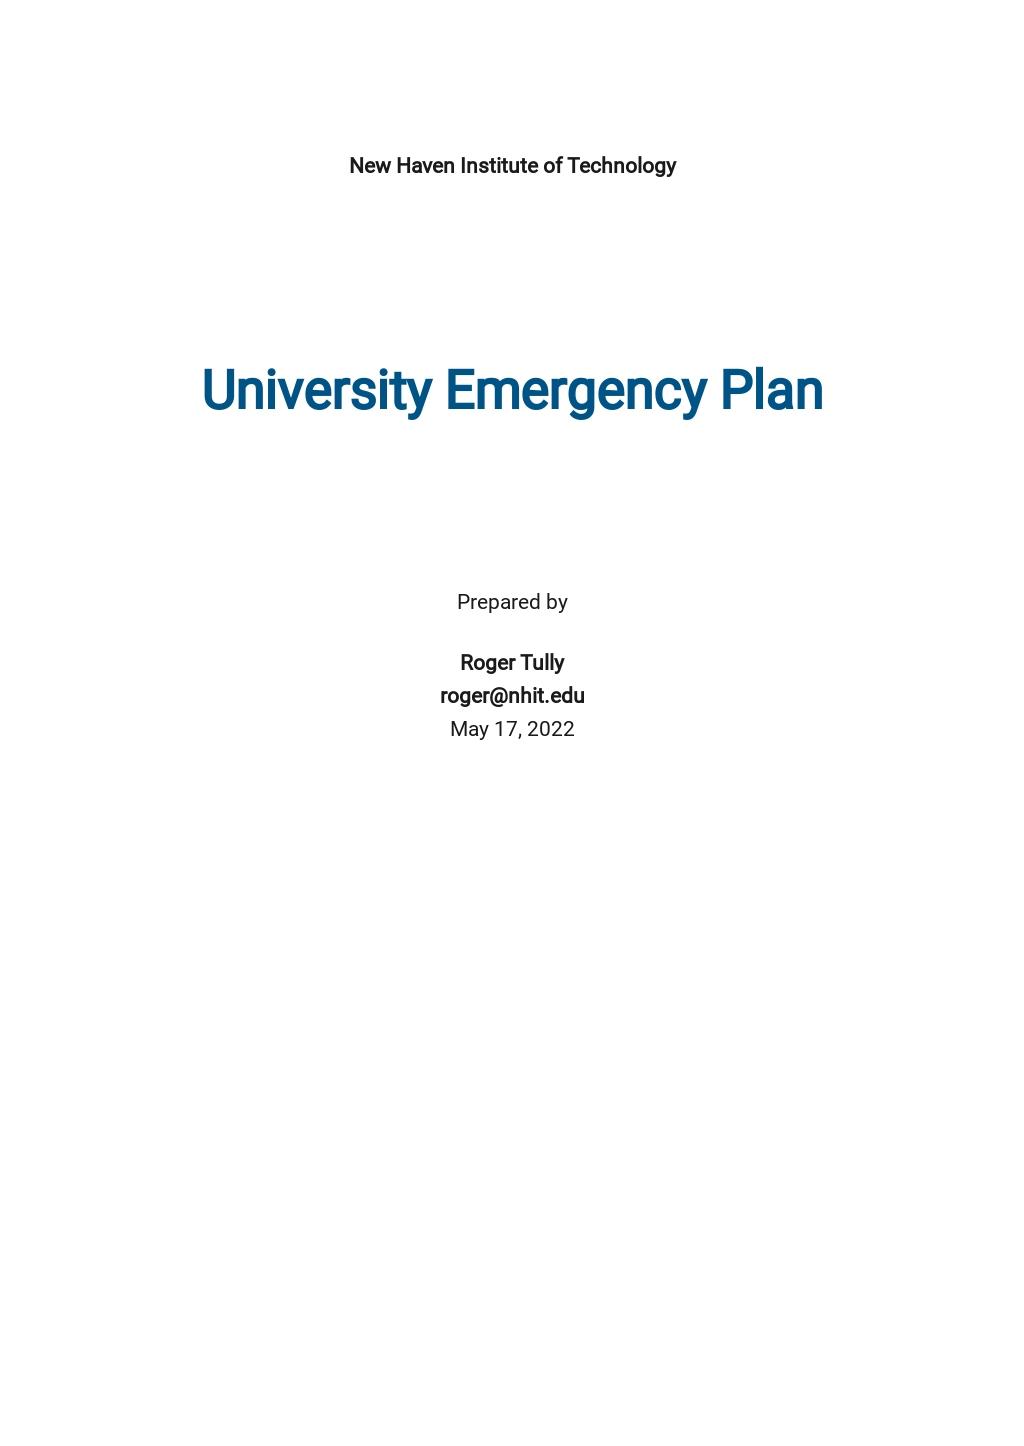 University Emergency Plan Template